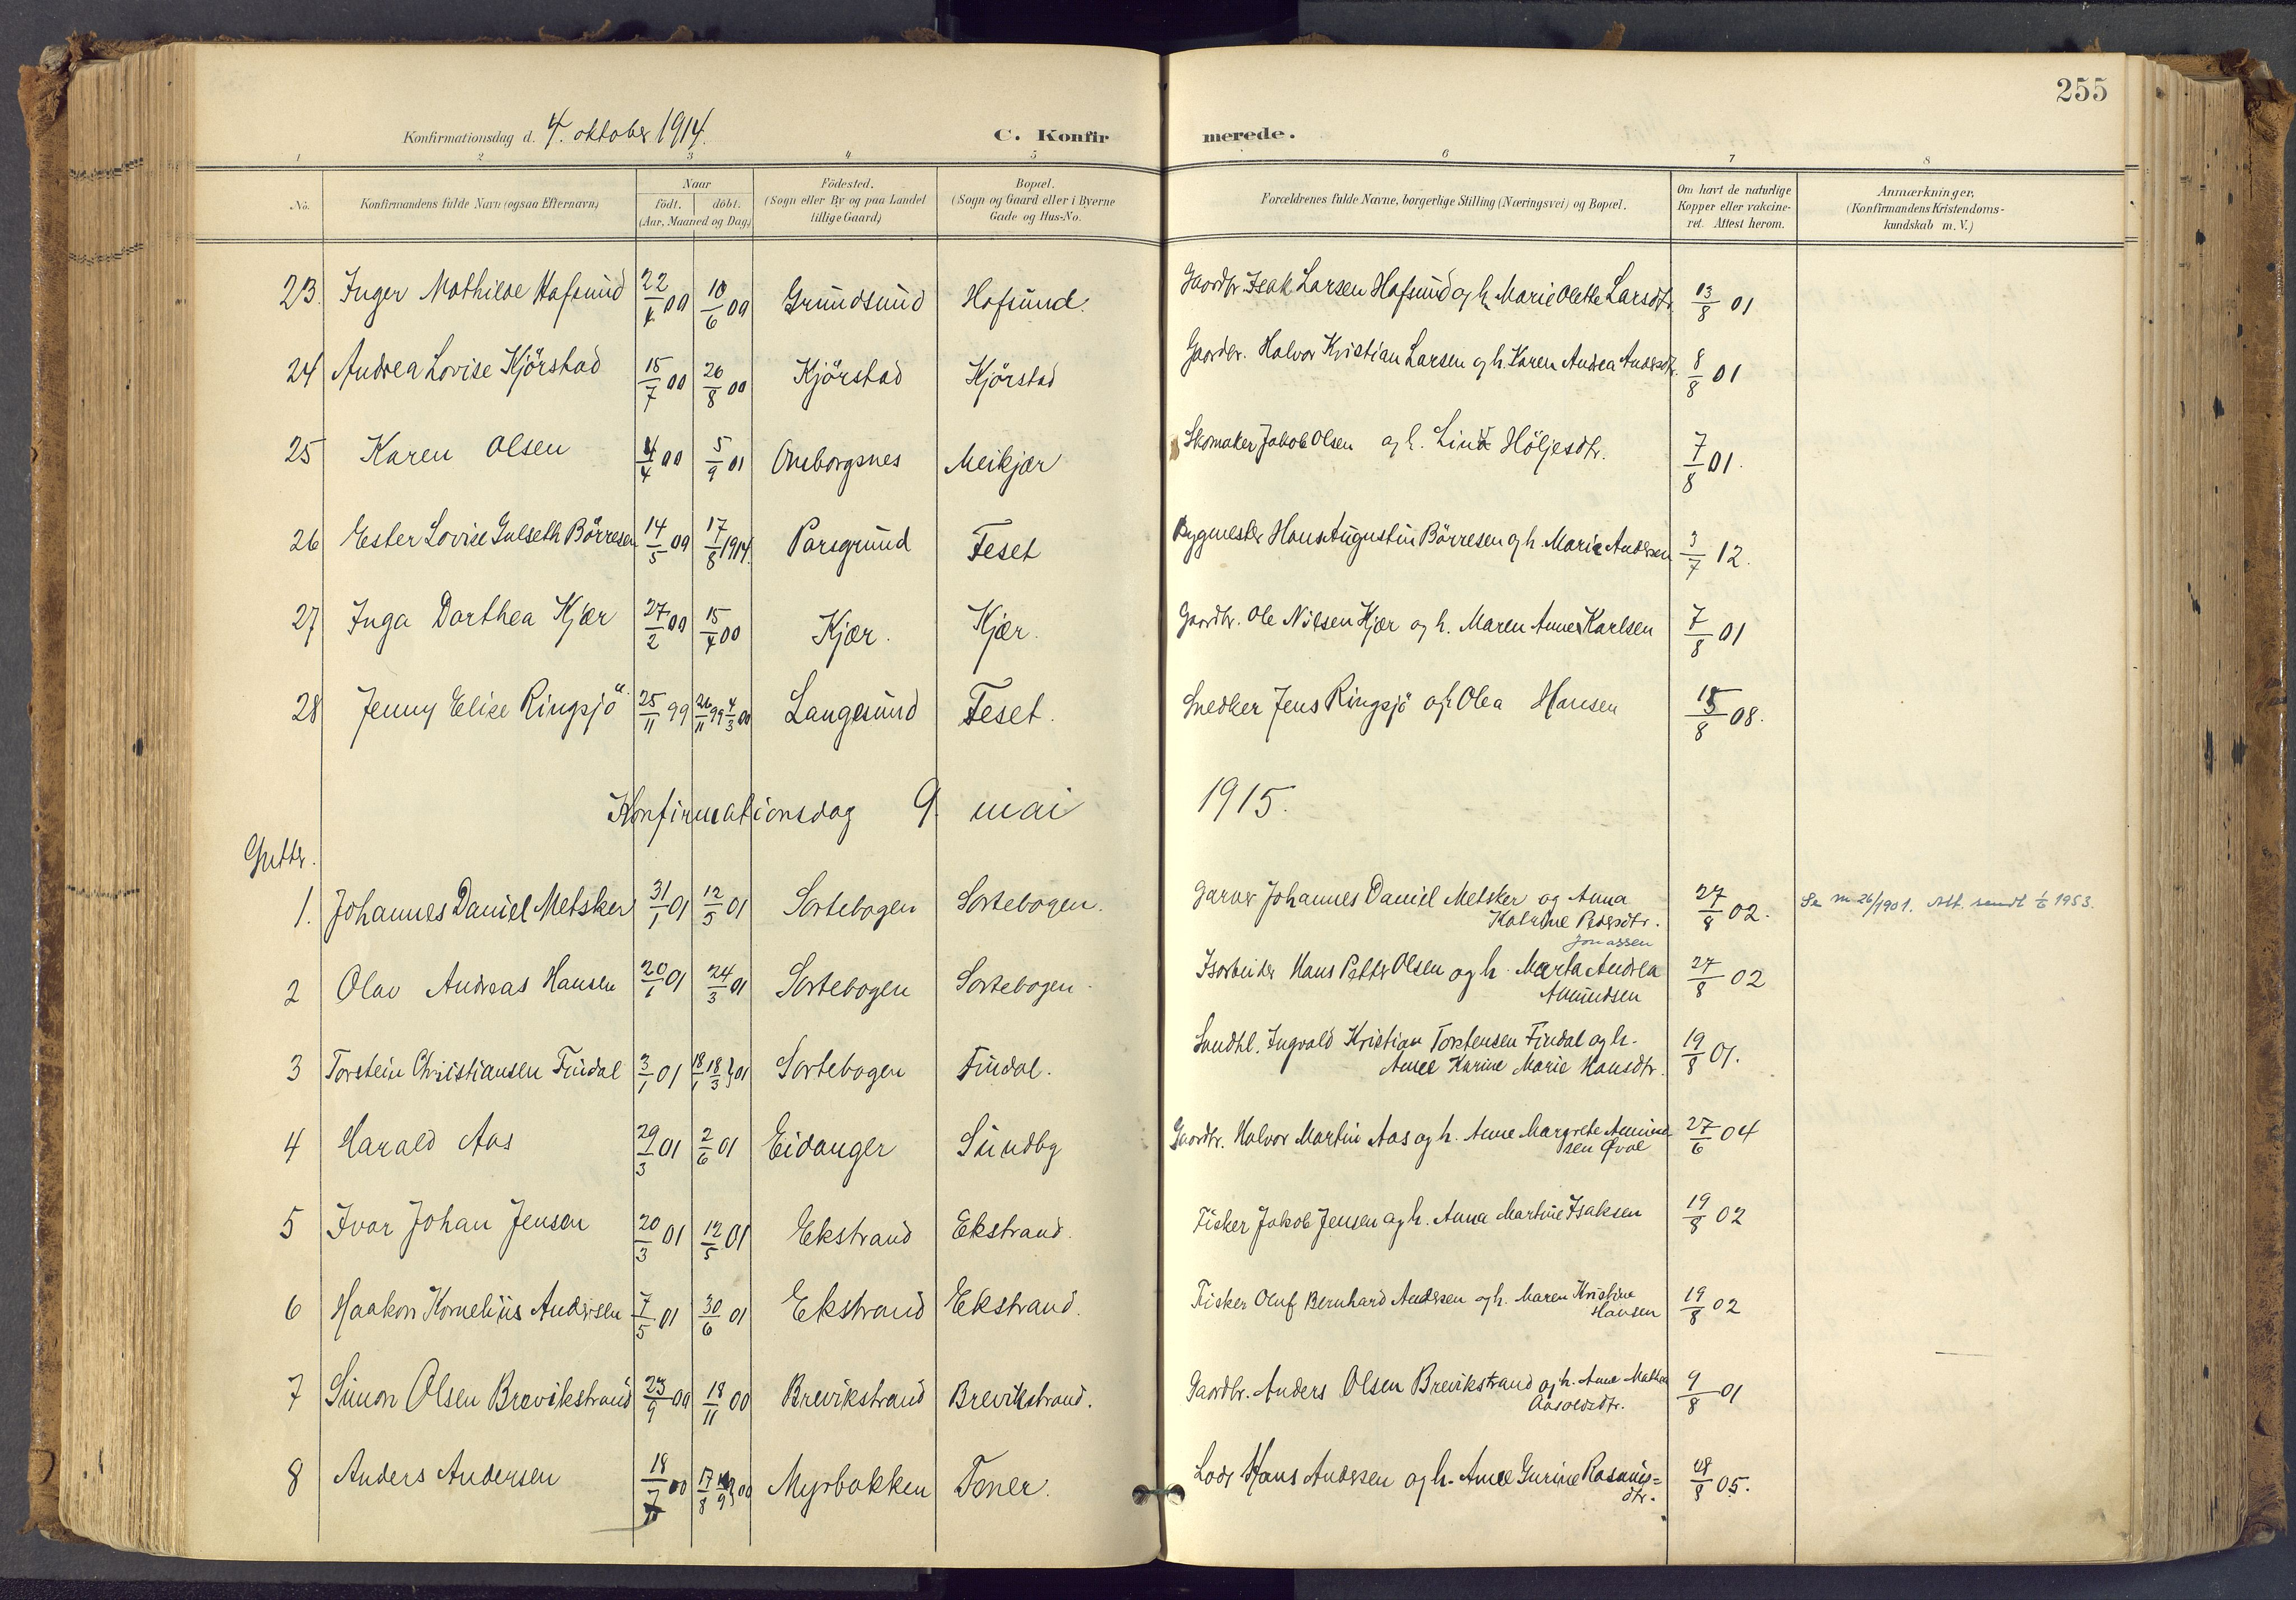 SAKO, Bamble kirkebøker, F/Fa/L0009: Ministerialbok nr. I 9, 1901-1917, s. 255